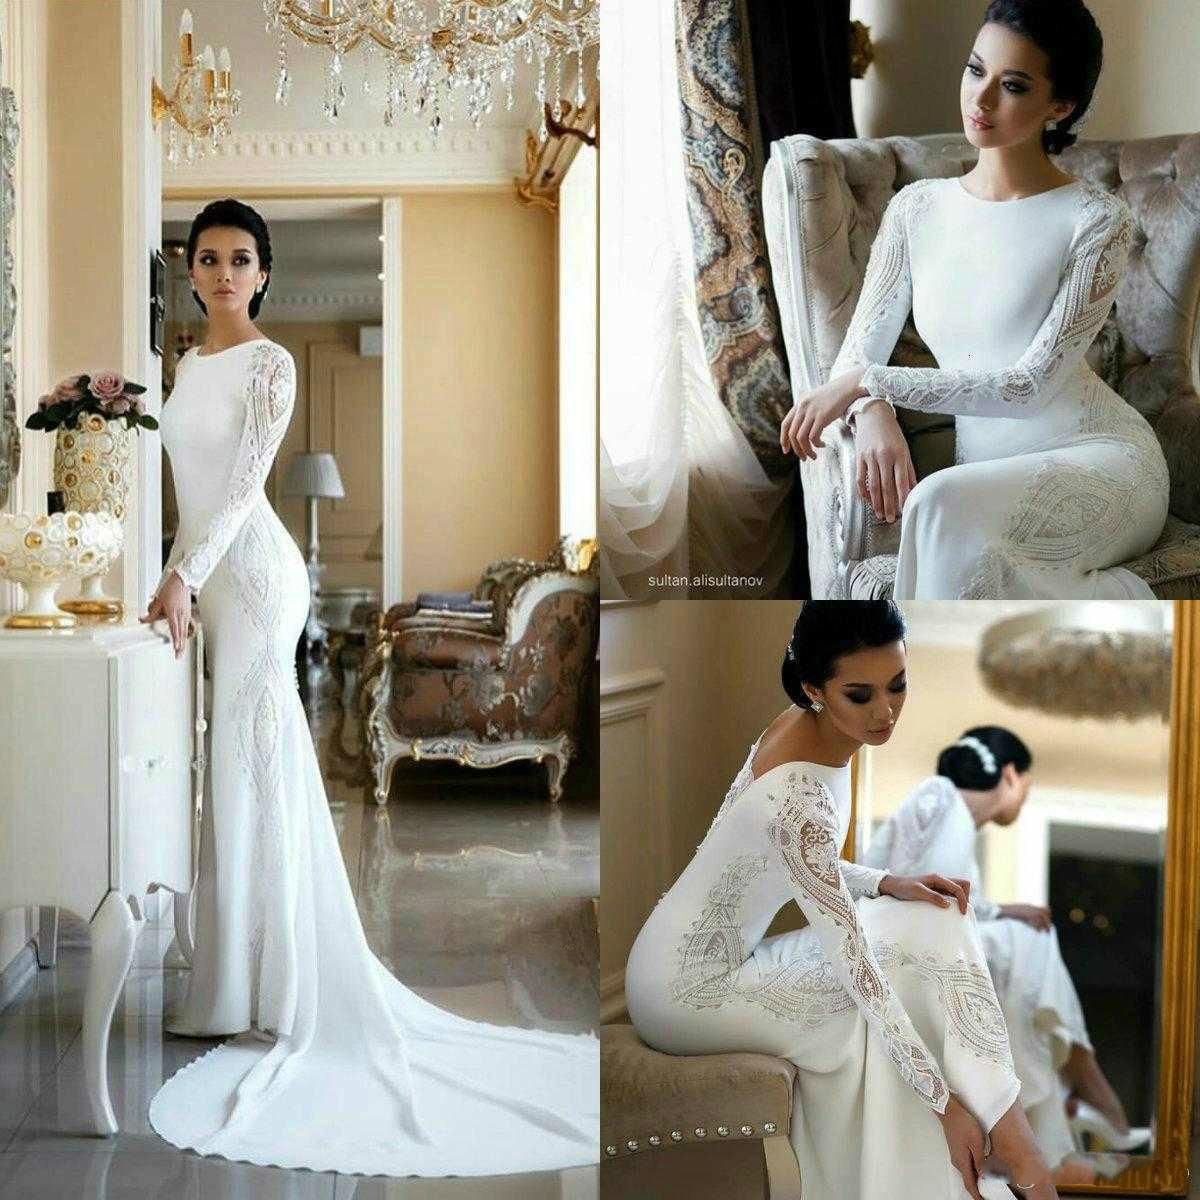 2020 Wedding Dresses Lace Appliqued Beaded Berta Sweep Train Boho Wedding Dress Bridal Gowns Plus Size Sleeves Abiti Da Sposa